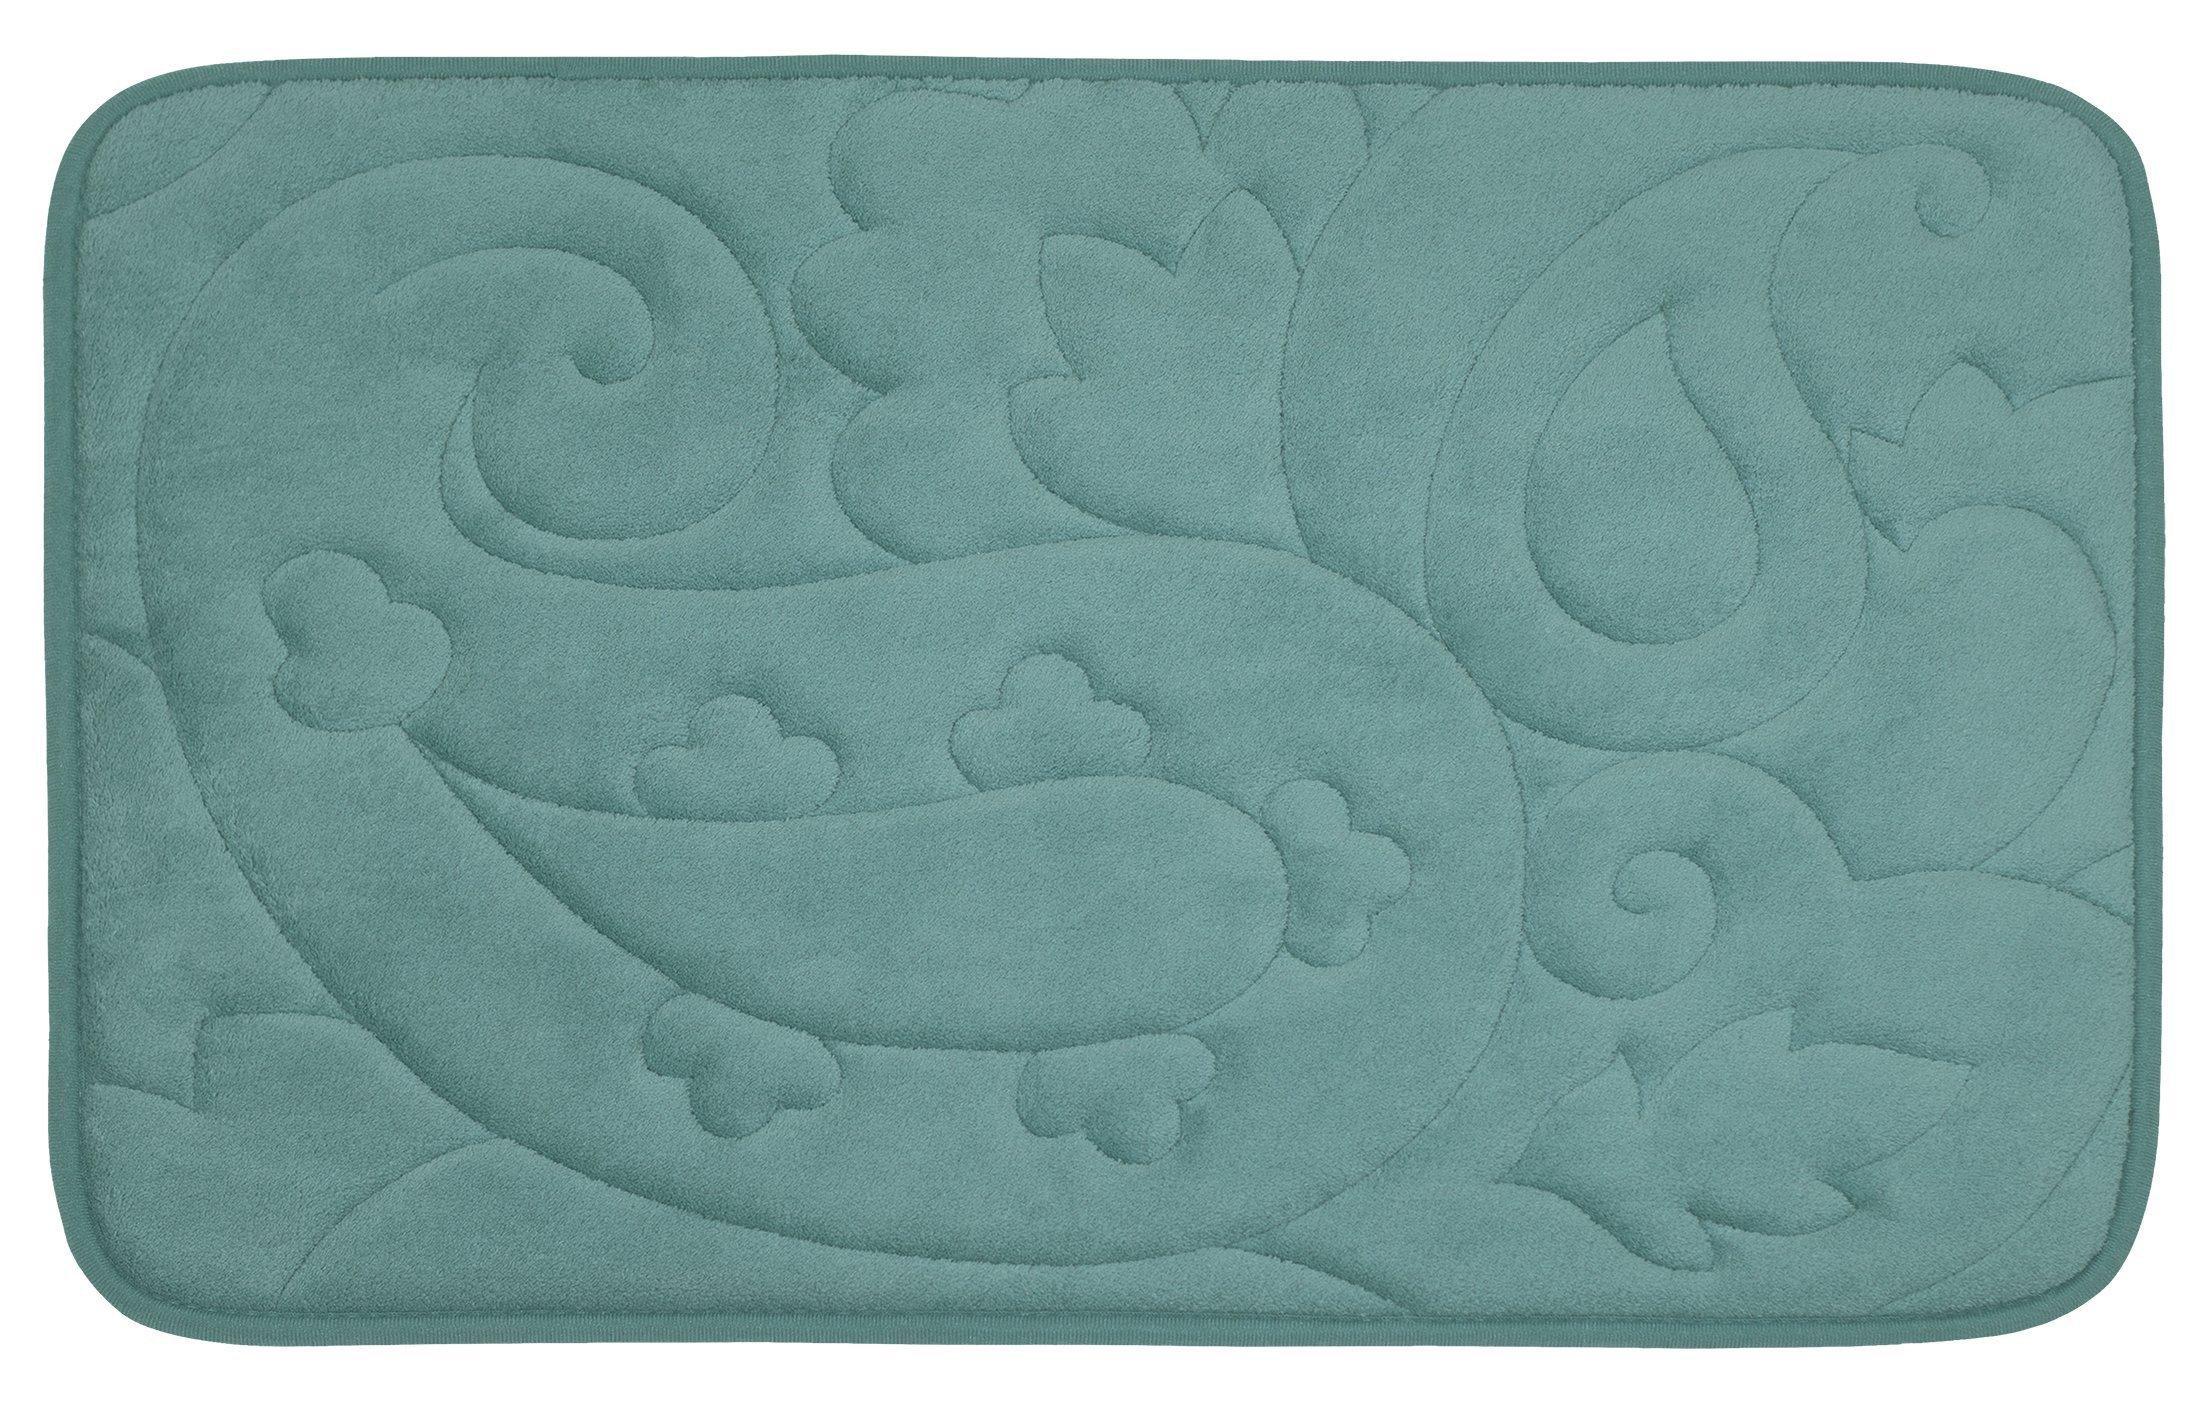 Bounce Comfort Pelton Micro Plush Memory Foam Bath Mat with BounceComfort, 20 x 32 in. Marine Blue -  - bathroom-linens, bathroom, bath-mats - 9183AlgvPFL -